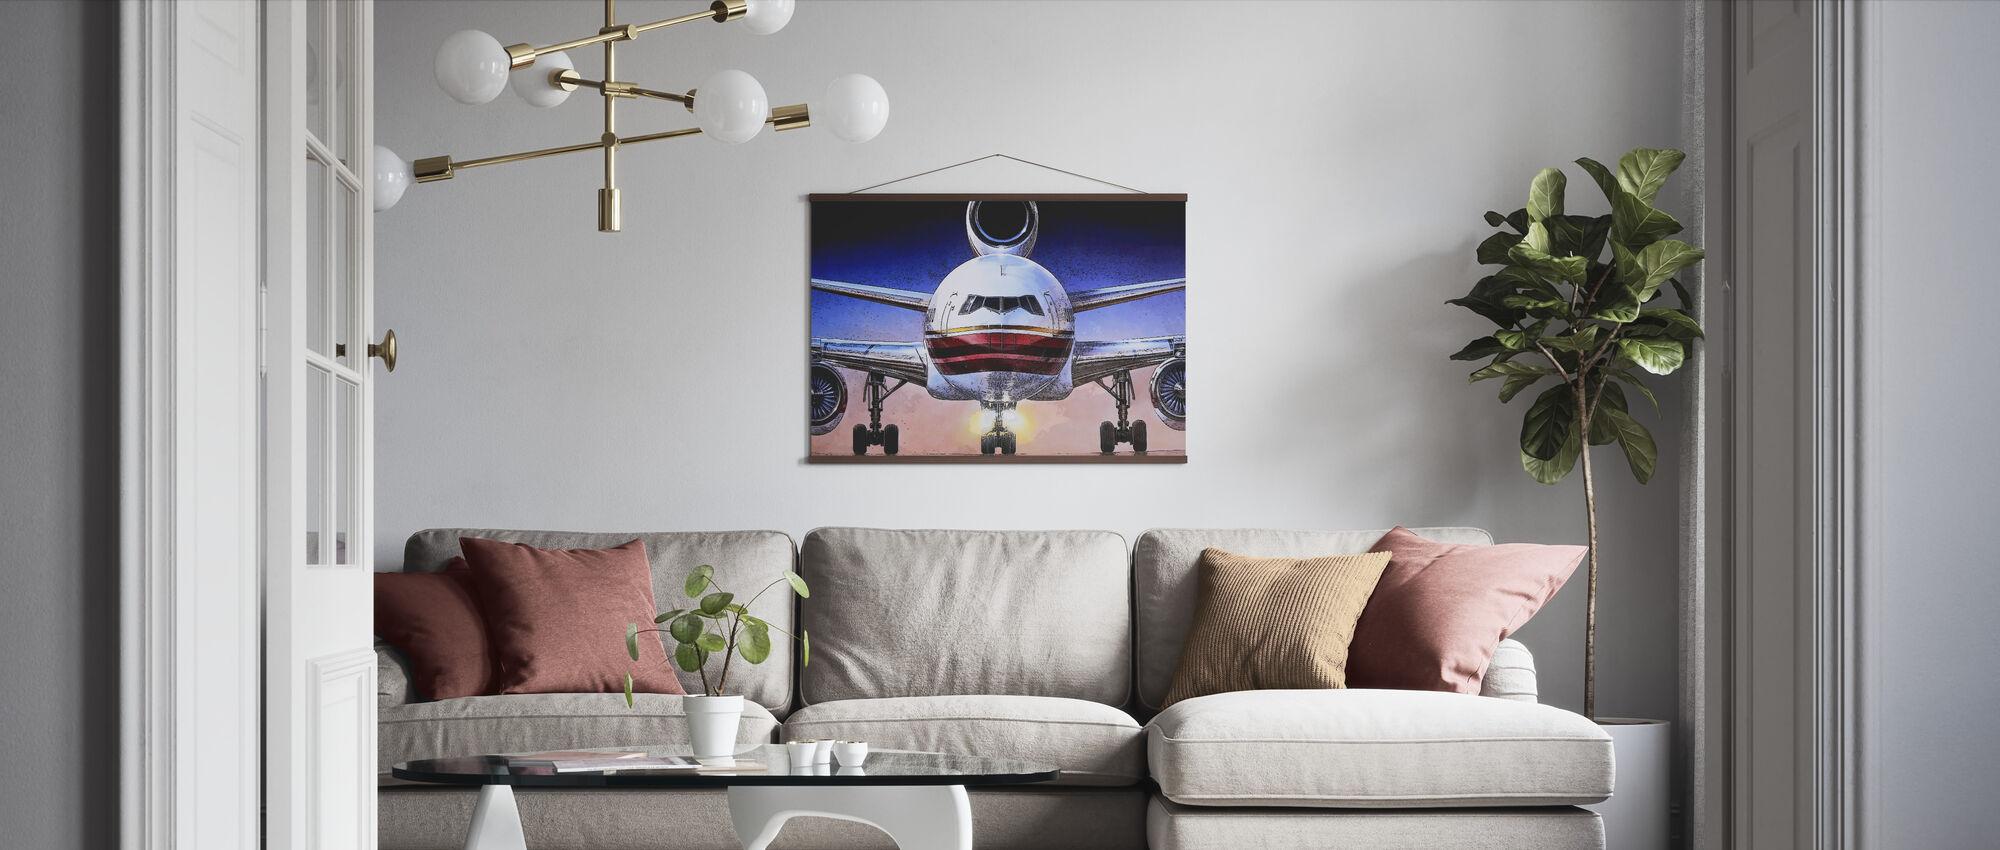 Airbus-juliste - Juliste - Olohuone